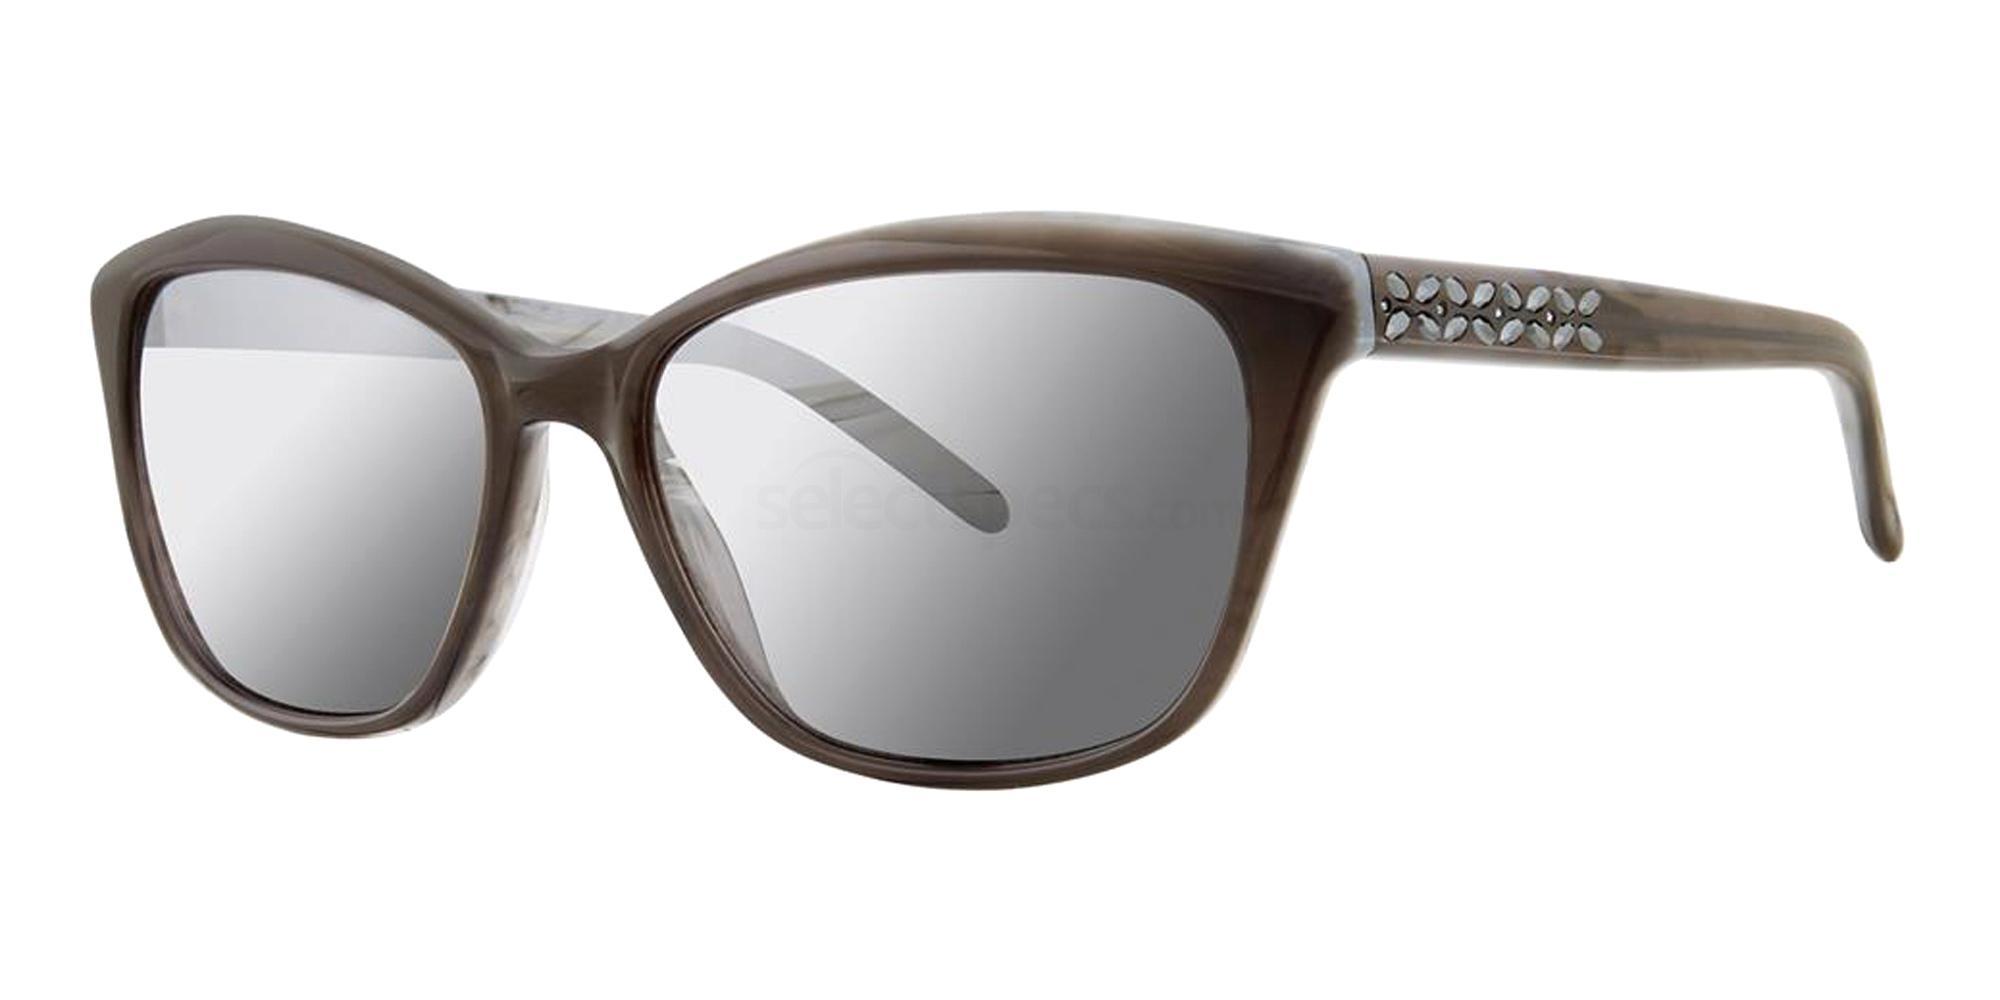 Dove DASNEE Sunglasses, Vera Wang Luxe